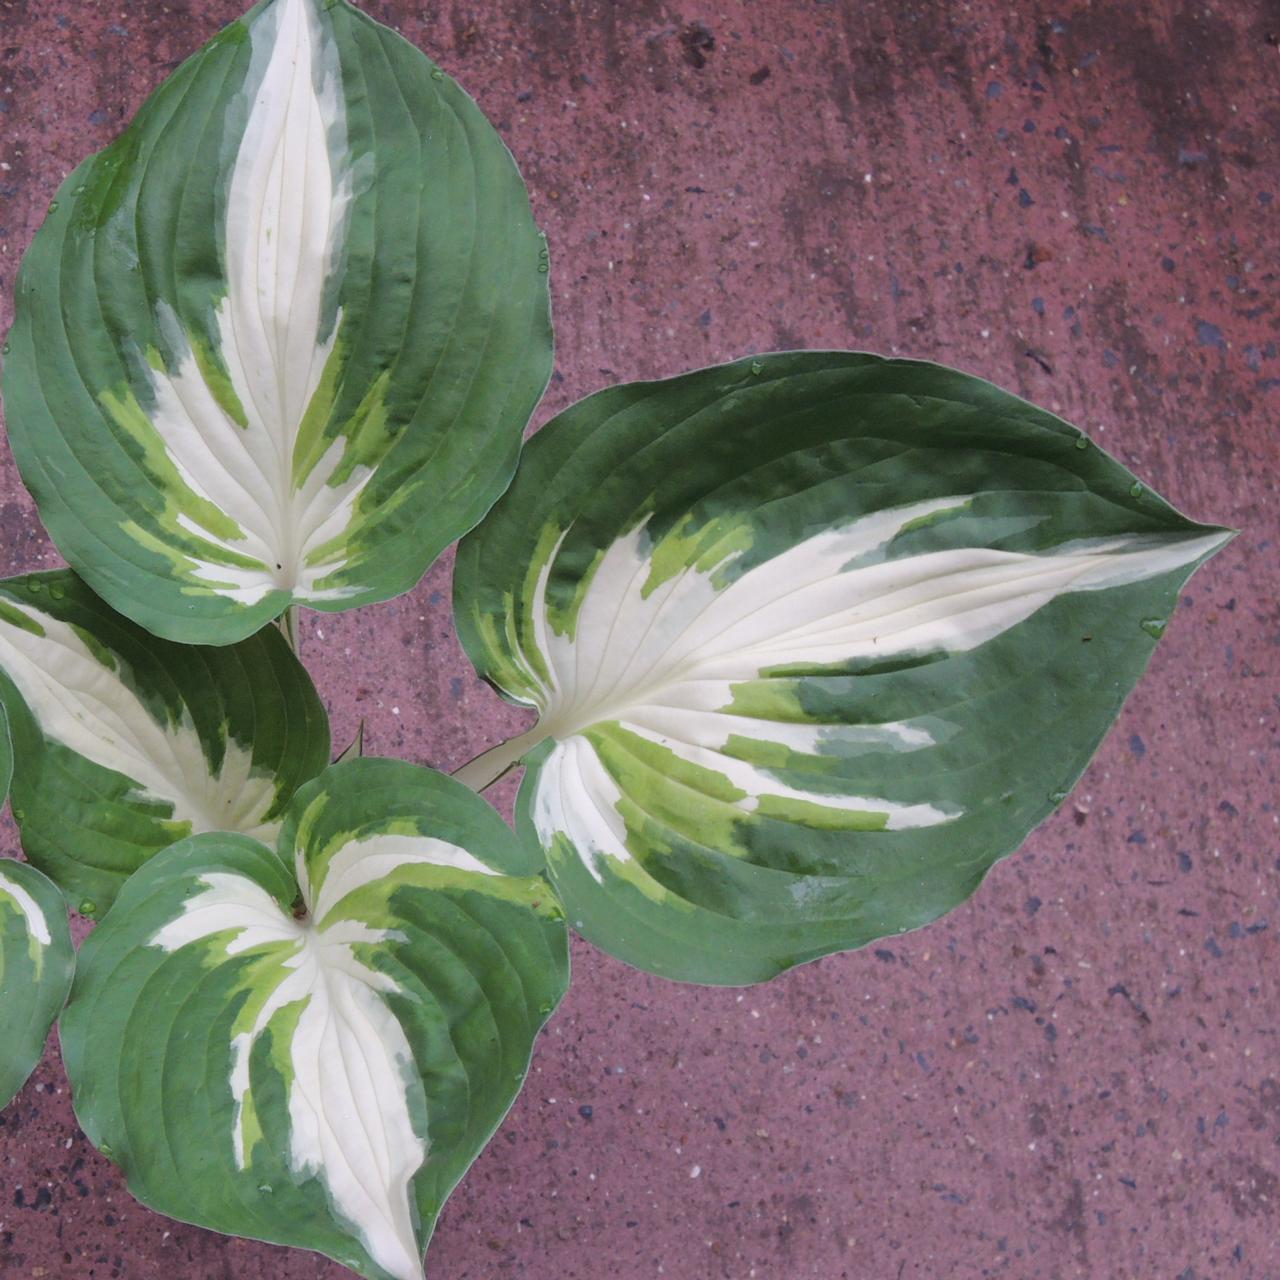 Hosta 'Christmas Island' plant